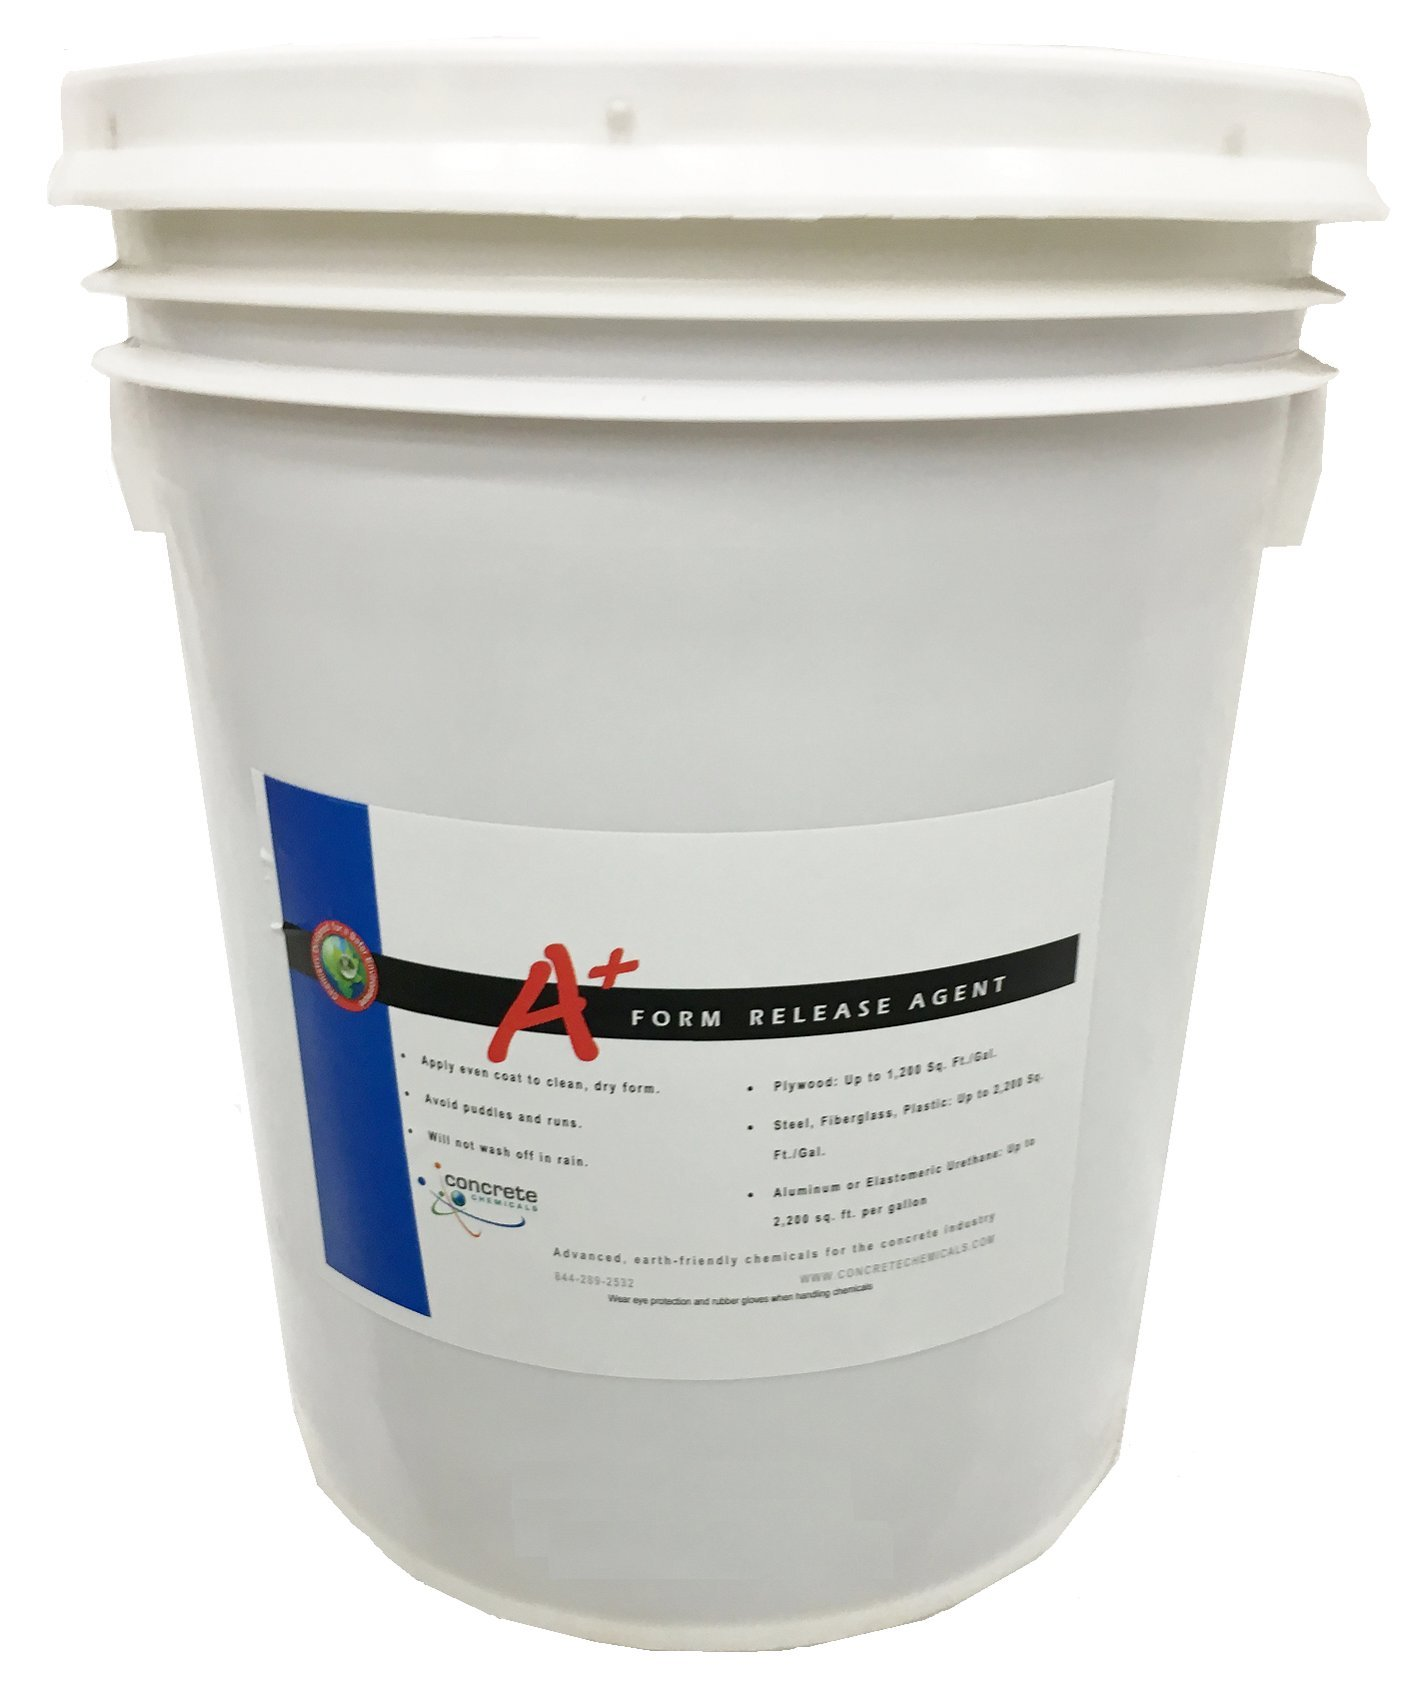 A + Form Release Agent 5 Gallon by Concrete Chemicals